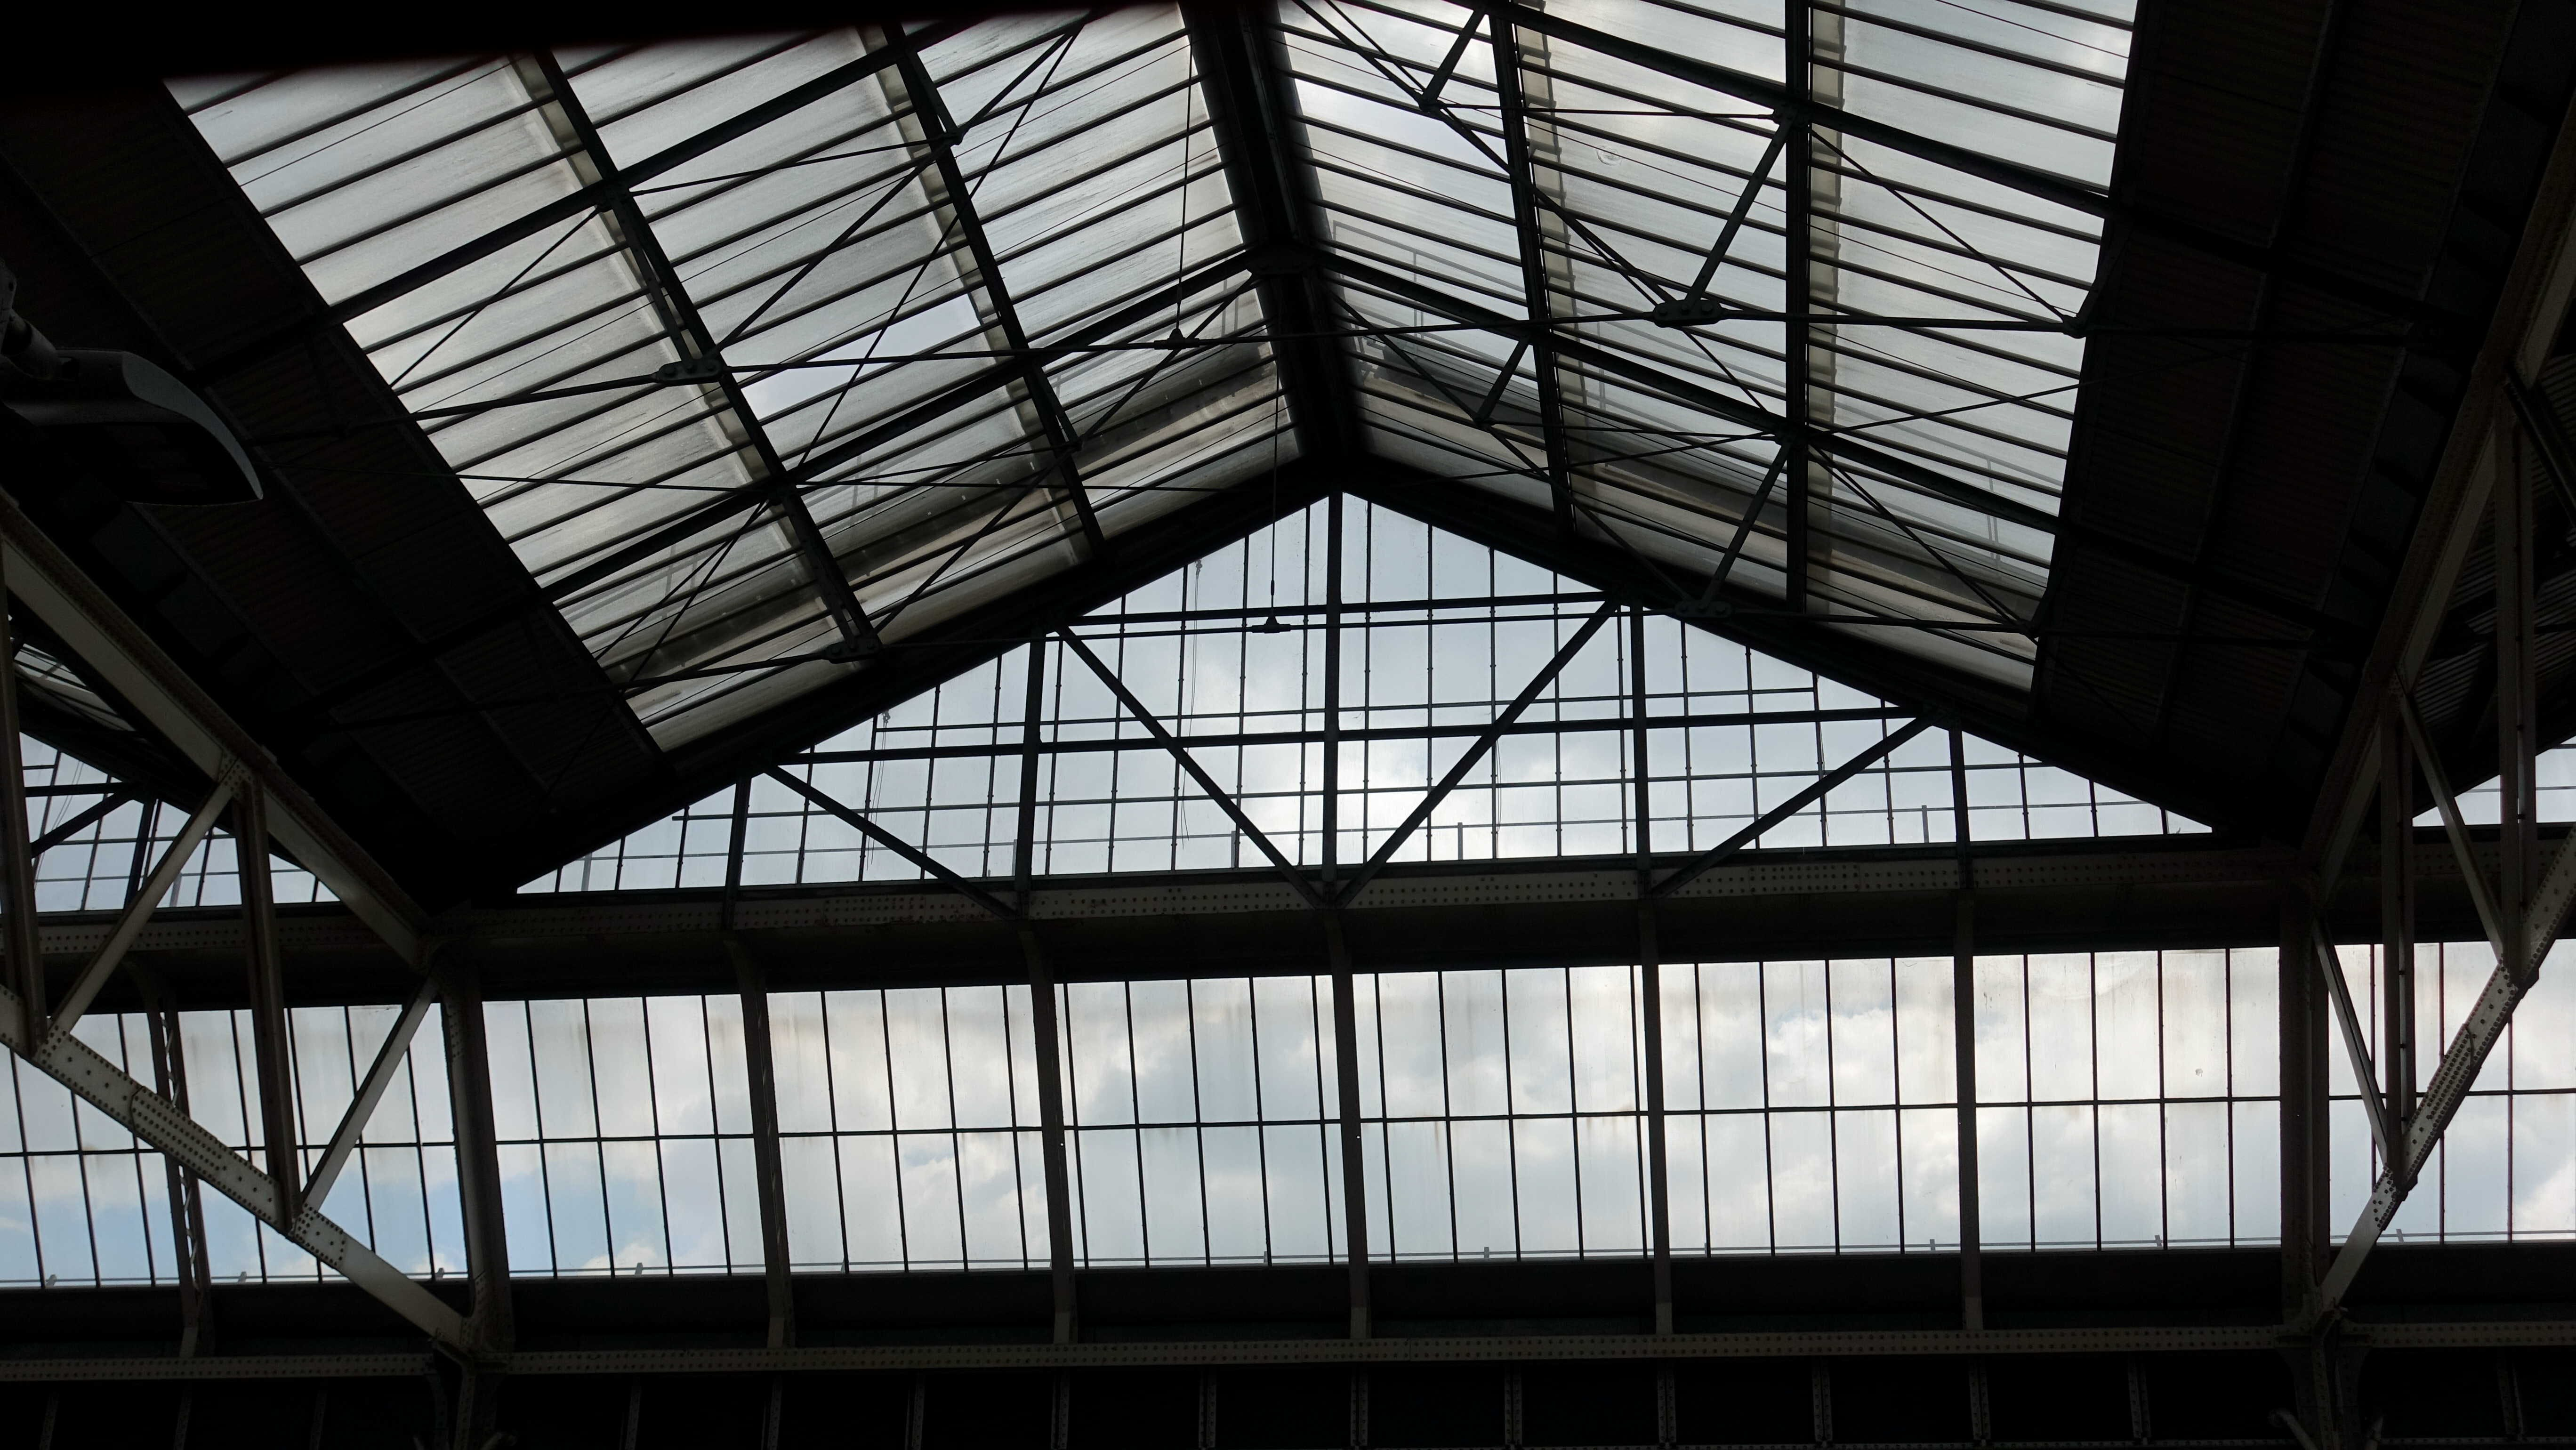 Free stock photo of railway station, roof, skylight